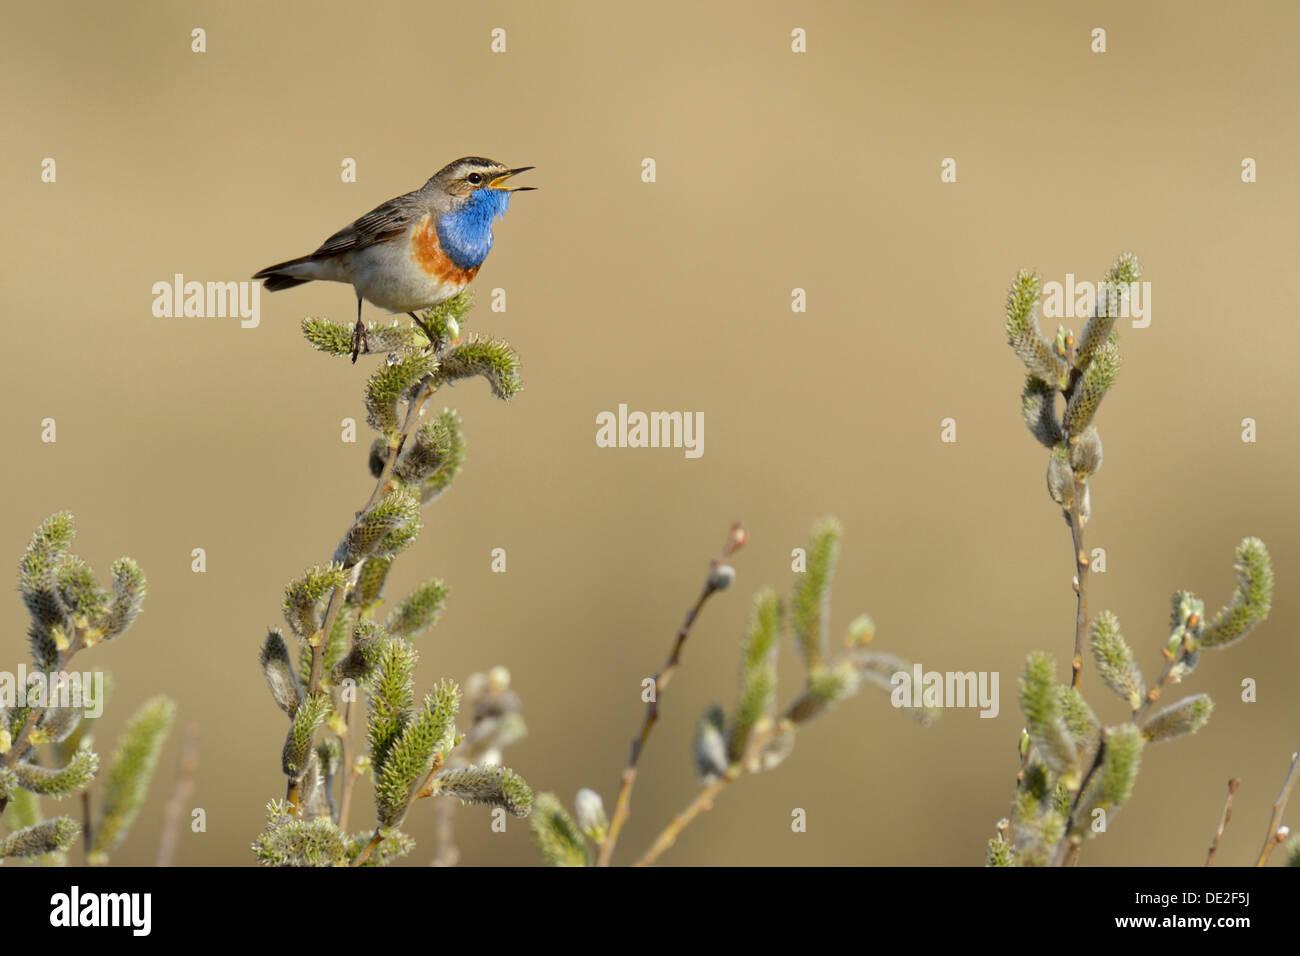 Bluethroat (Luscinia svecica cyanecula), singing on perch, De Geul, Texel, Texel, West Frisian Islands - Stock Image